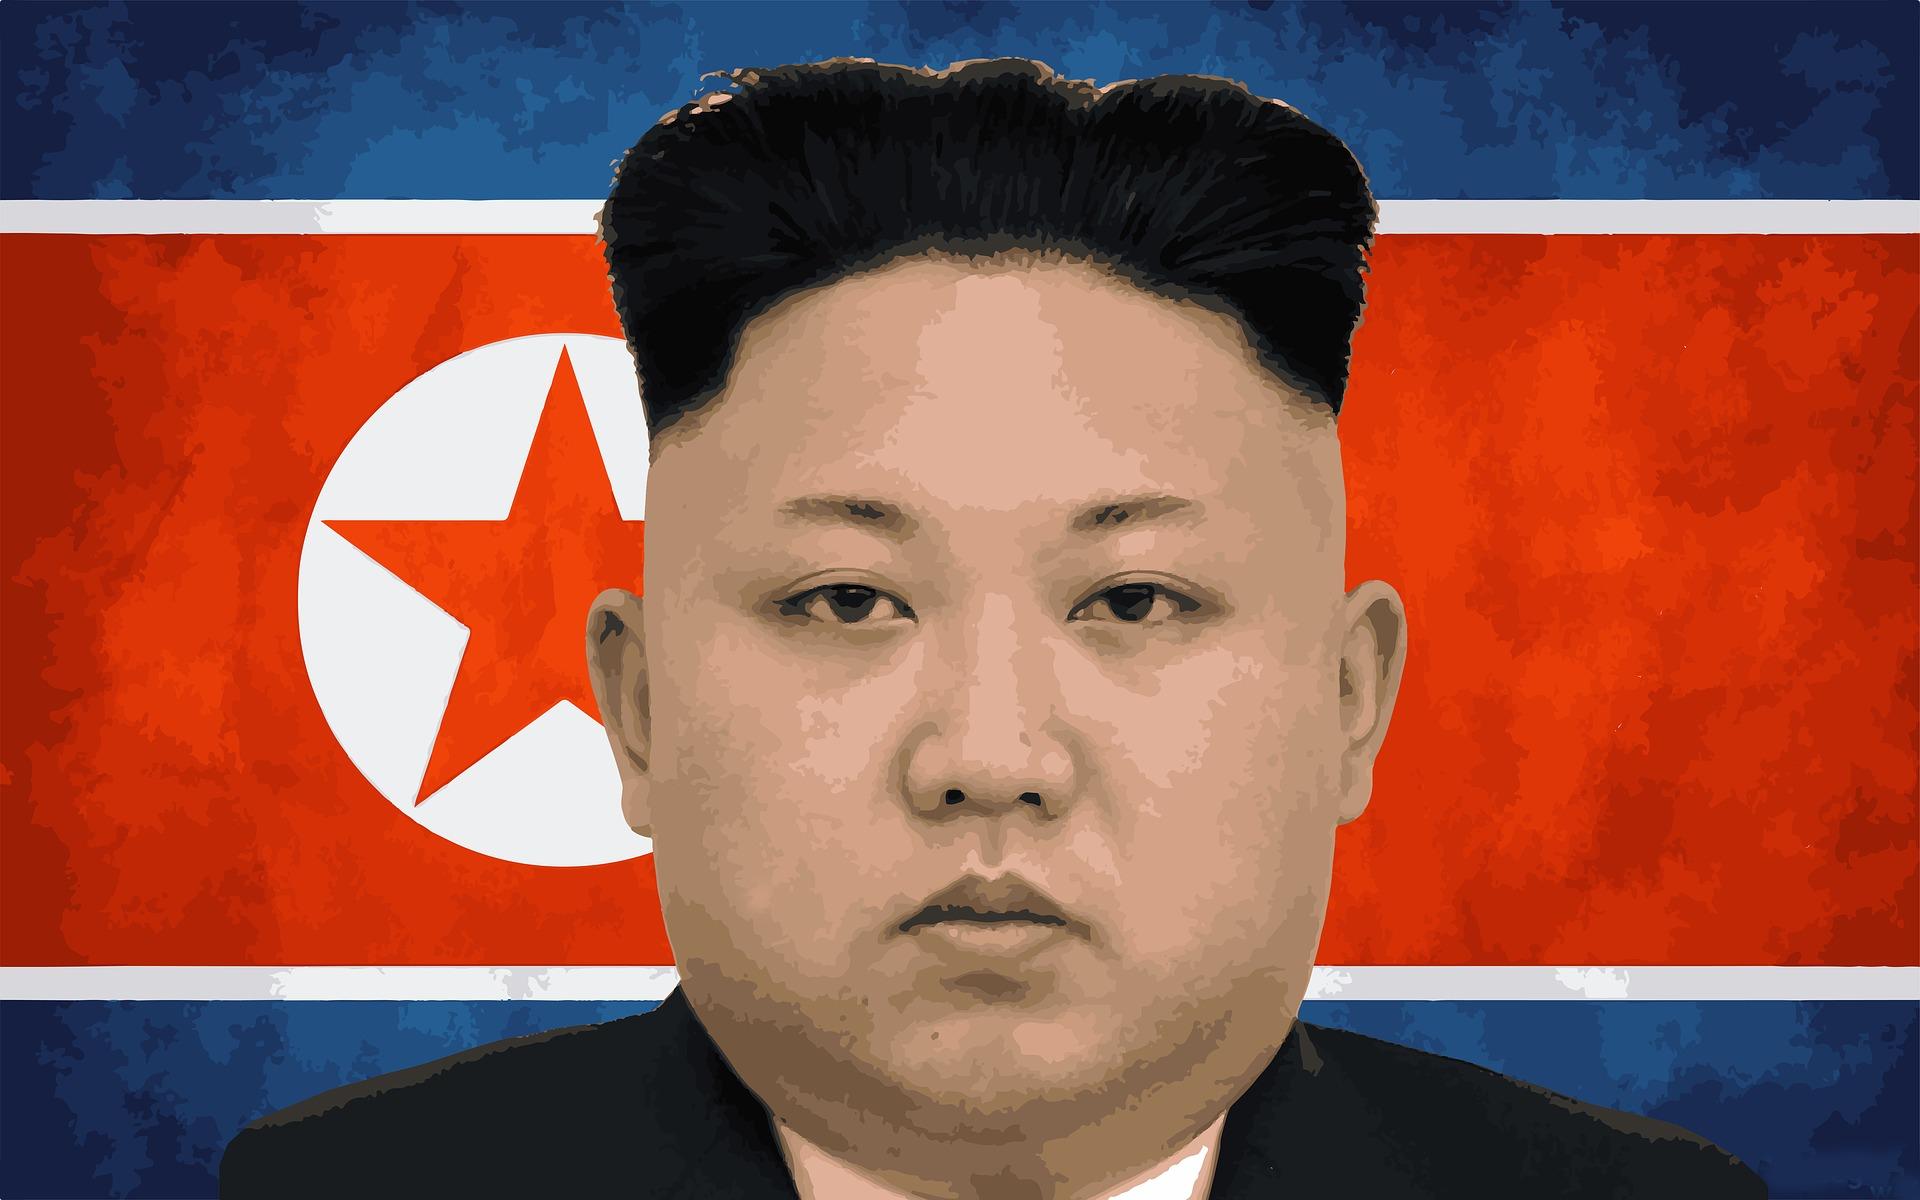 Nordkoreanische Botschaft in Mitte: Verdient Diktator Kim Jong-un bei diesem Berliner Hostel mit?